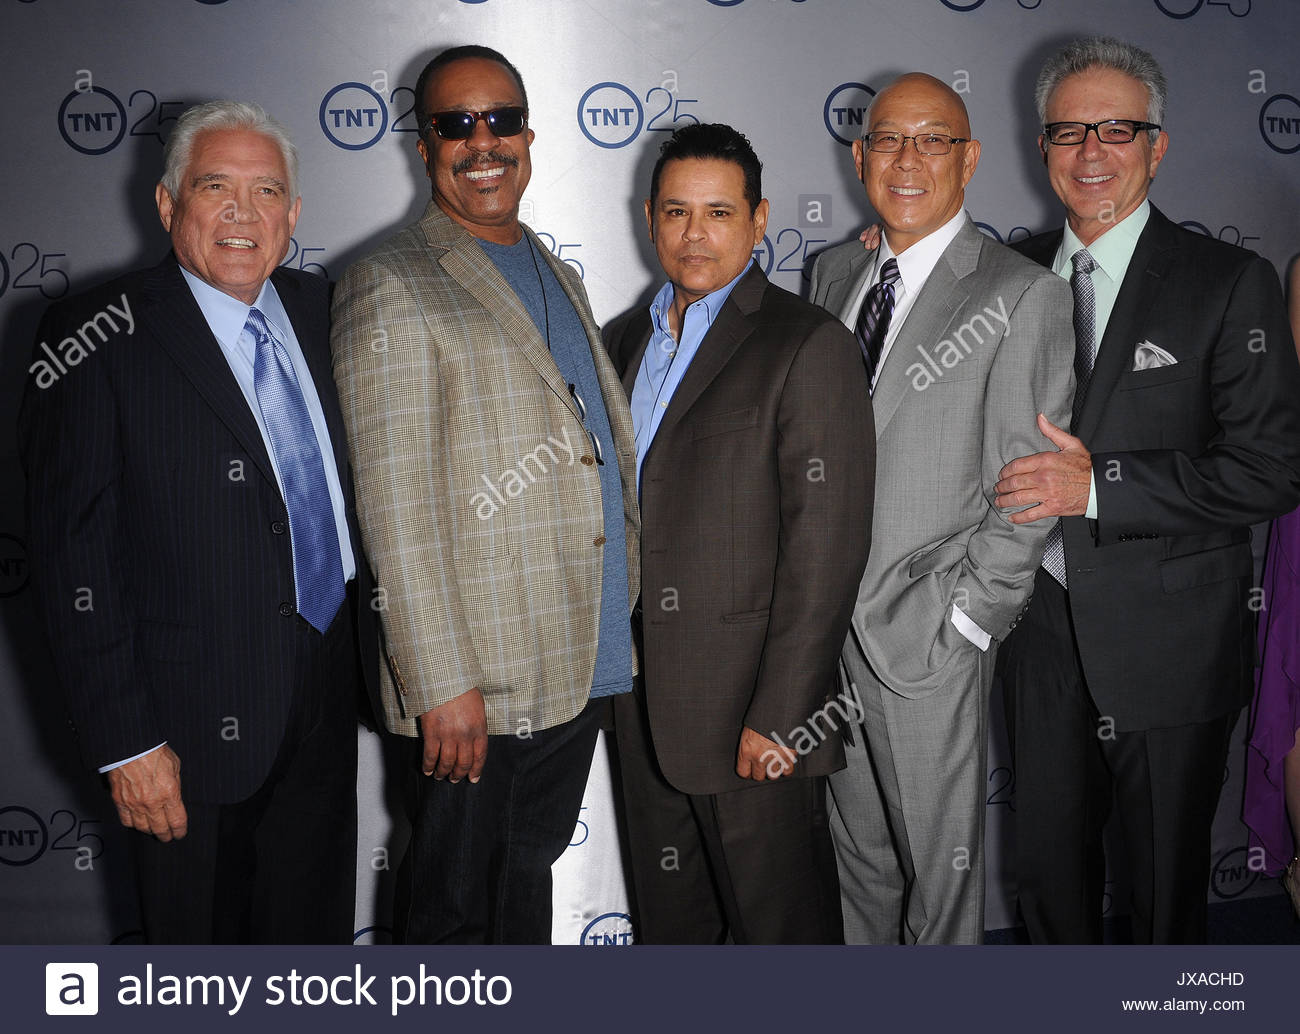 GW Bailey, Robert Gossett, Raymond Cruz, Michael Paul Chan und Tony Denison. Prominente kommen an der TNT 25. Jahrestag Stockbild